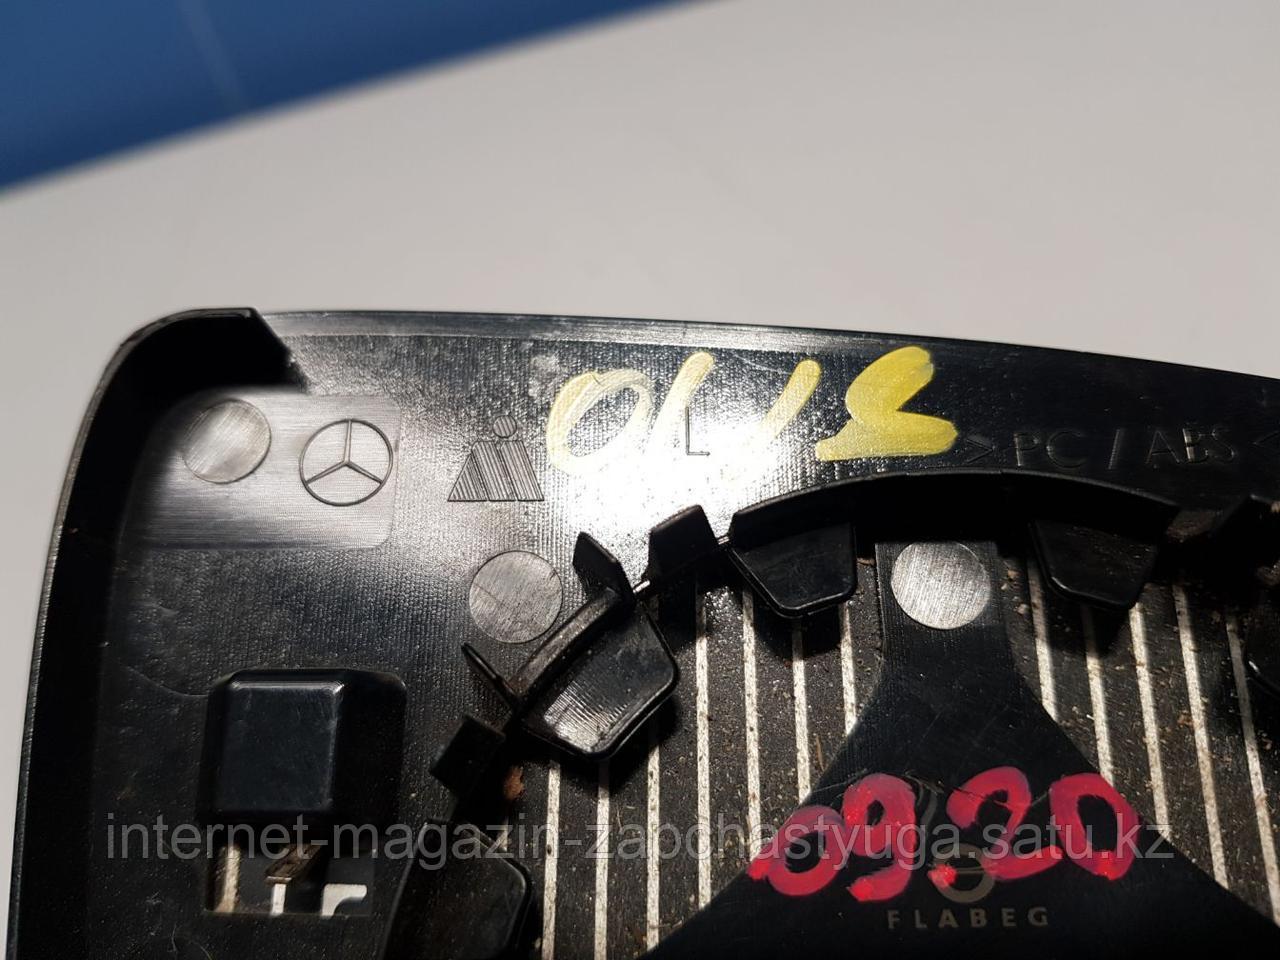 A1698102121 Зеркальный элемент левый для Mercedes A-klasse W169 2004-2012 Б/У - фото 4